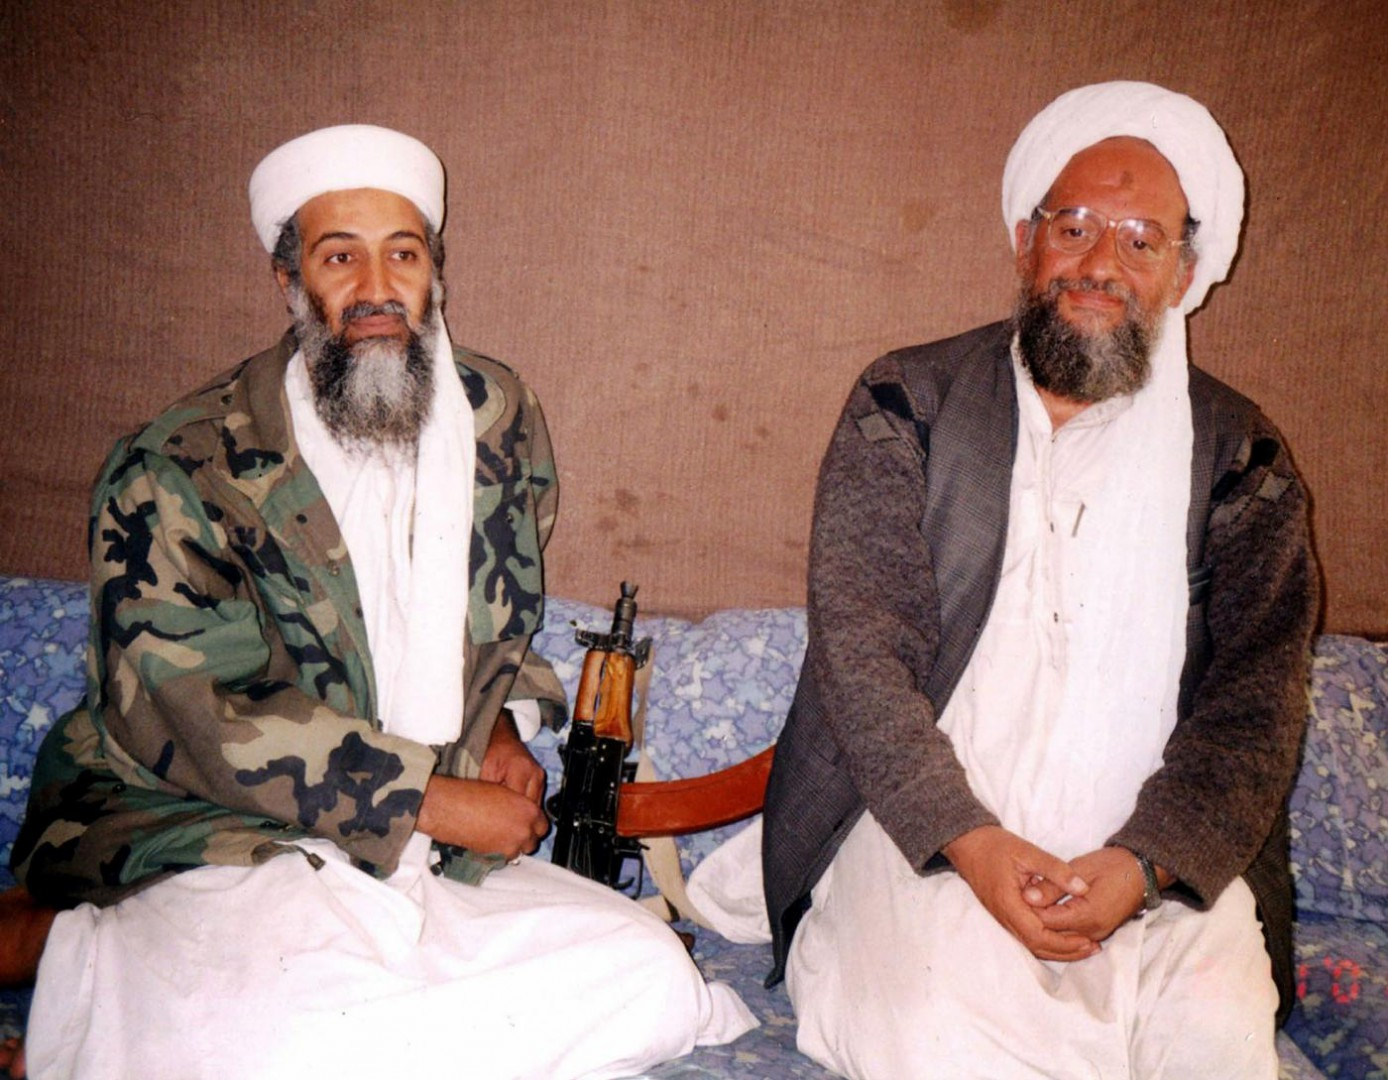 Osama Bin Laden (LaPresse)